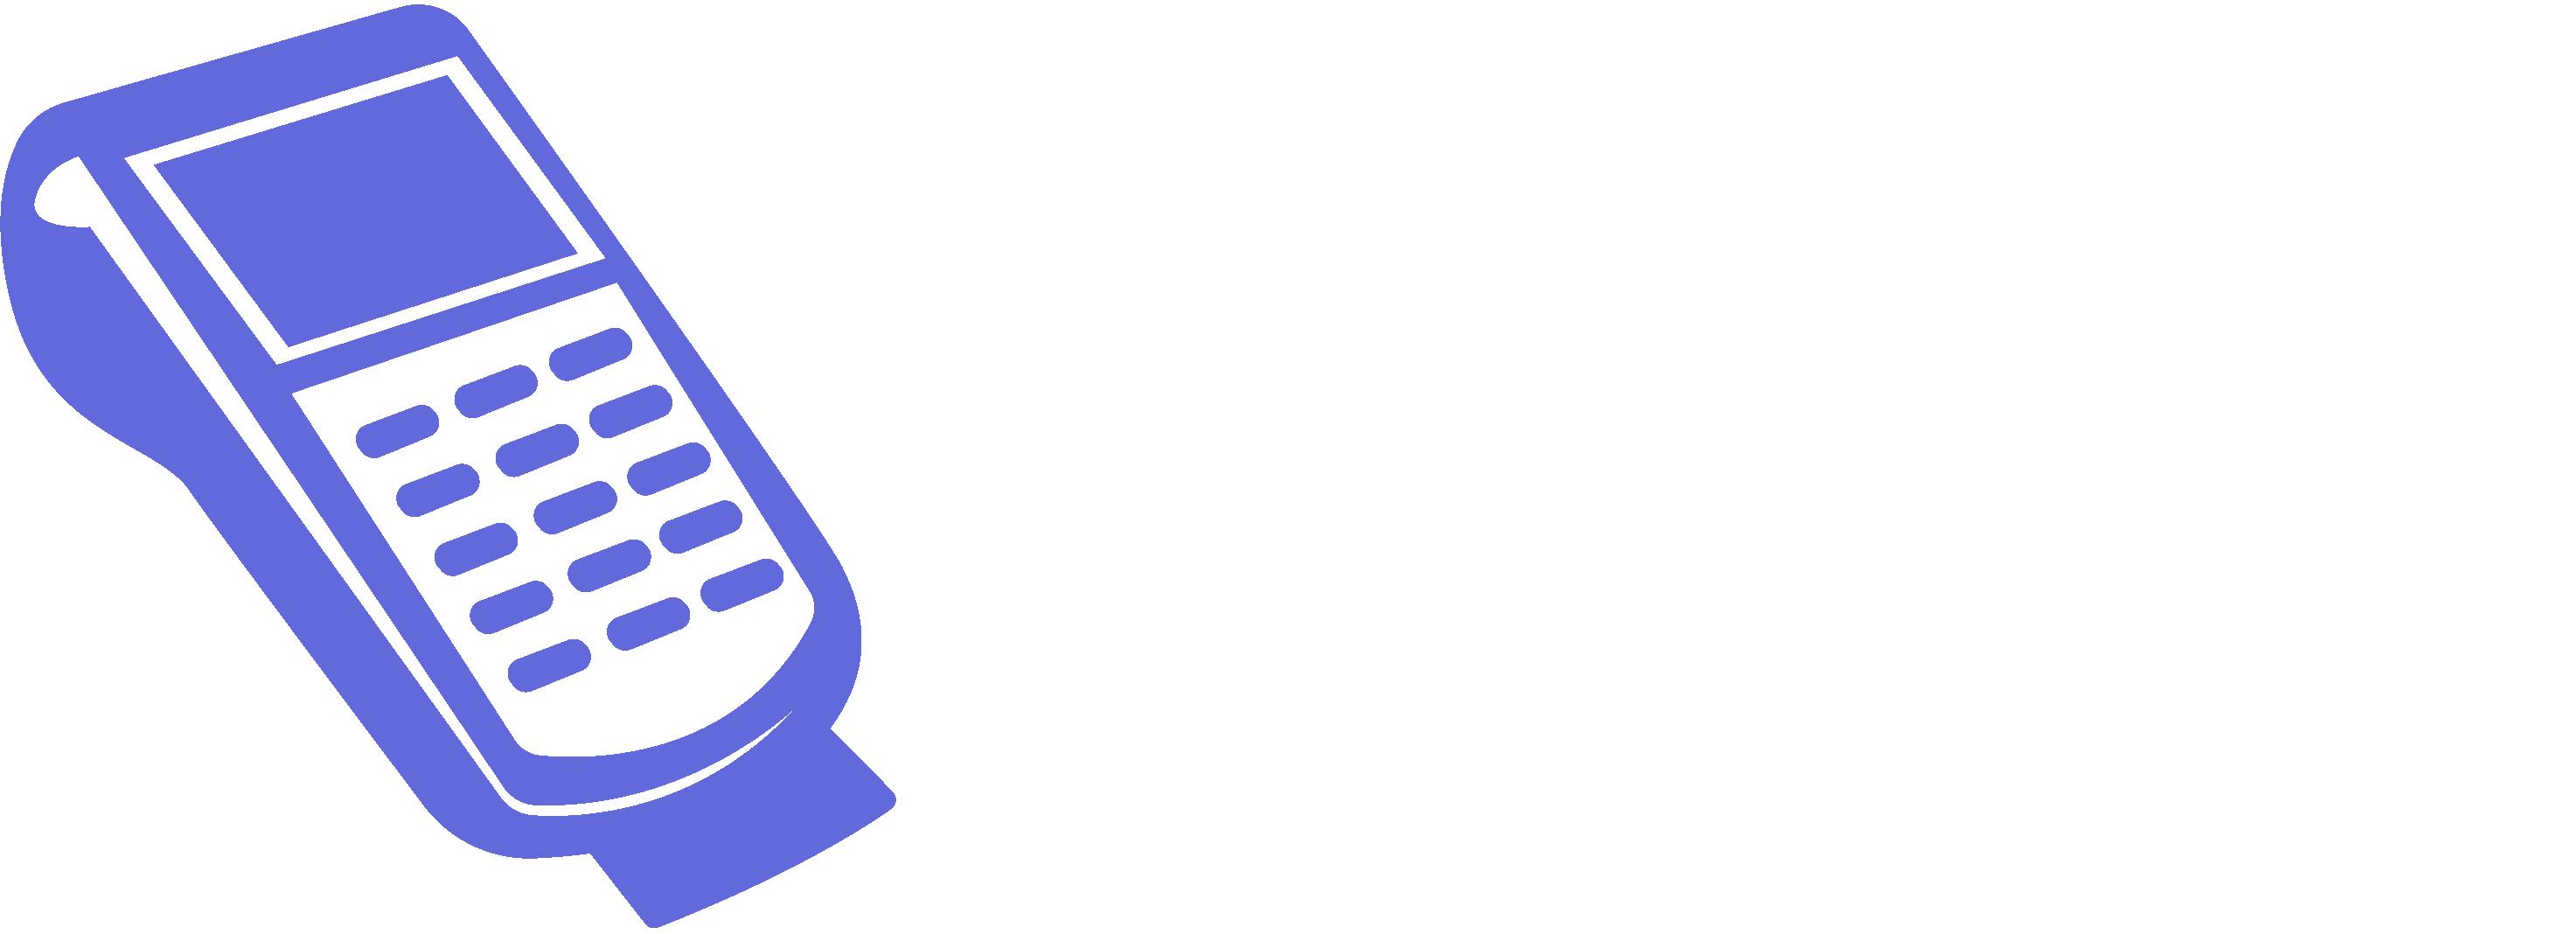 Card Payment Guru Logo